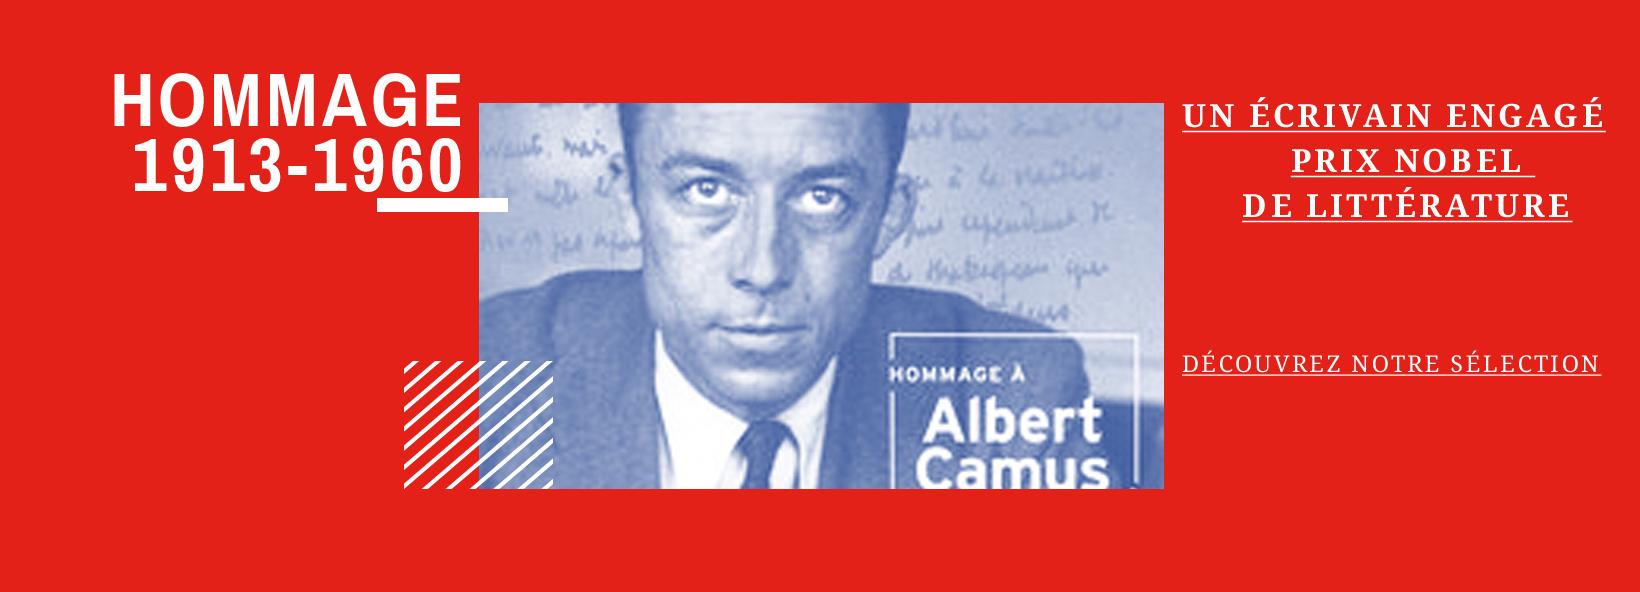 Hommage à Albert Camus